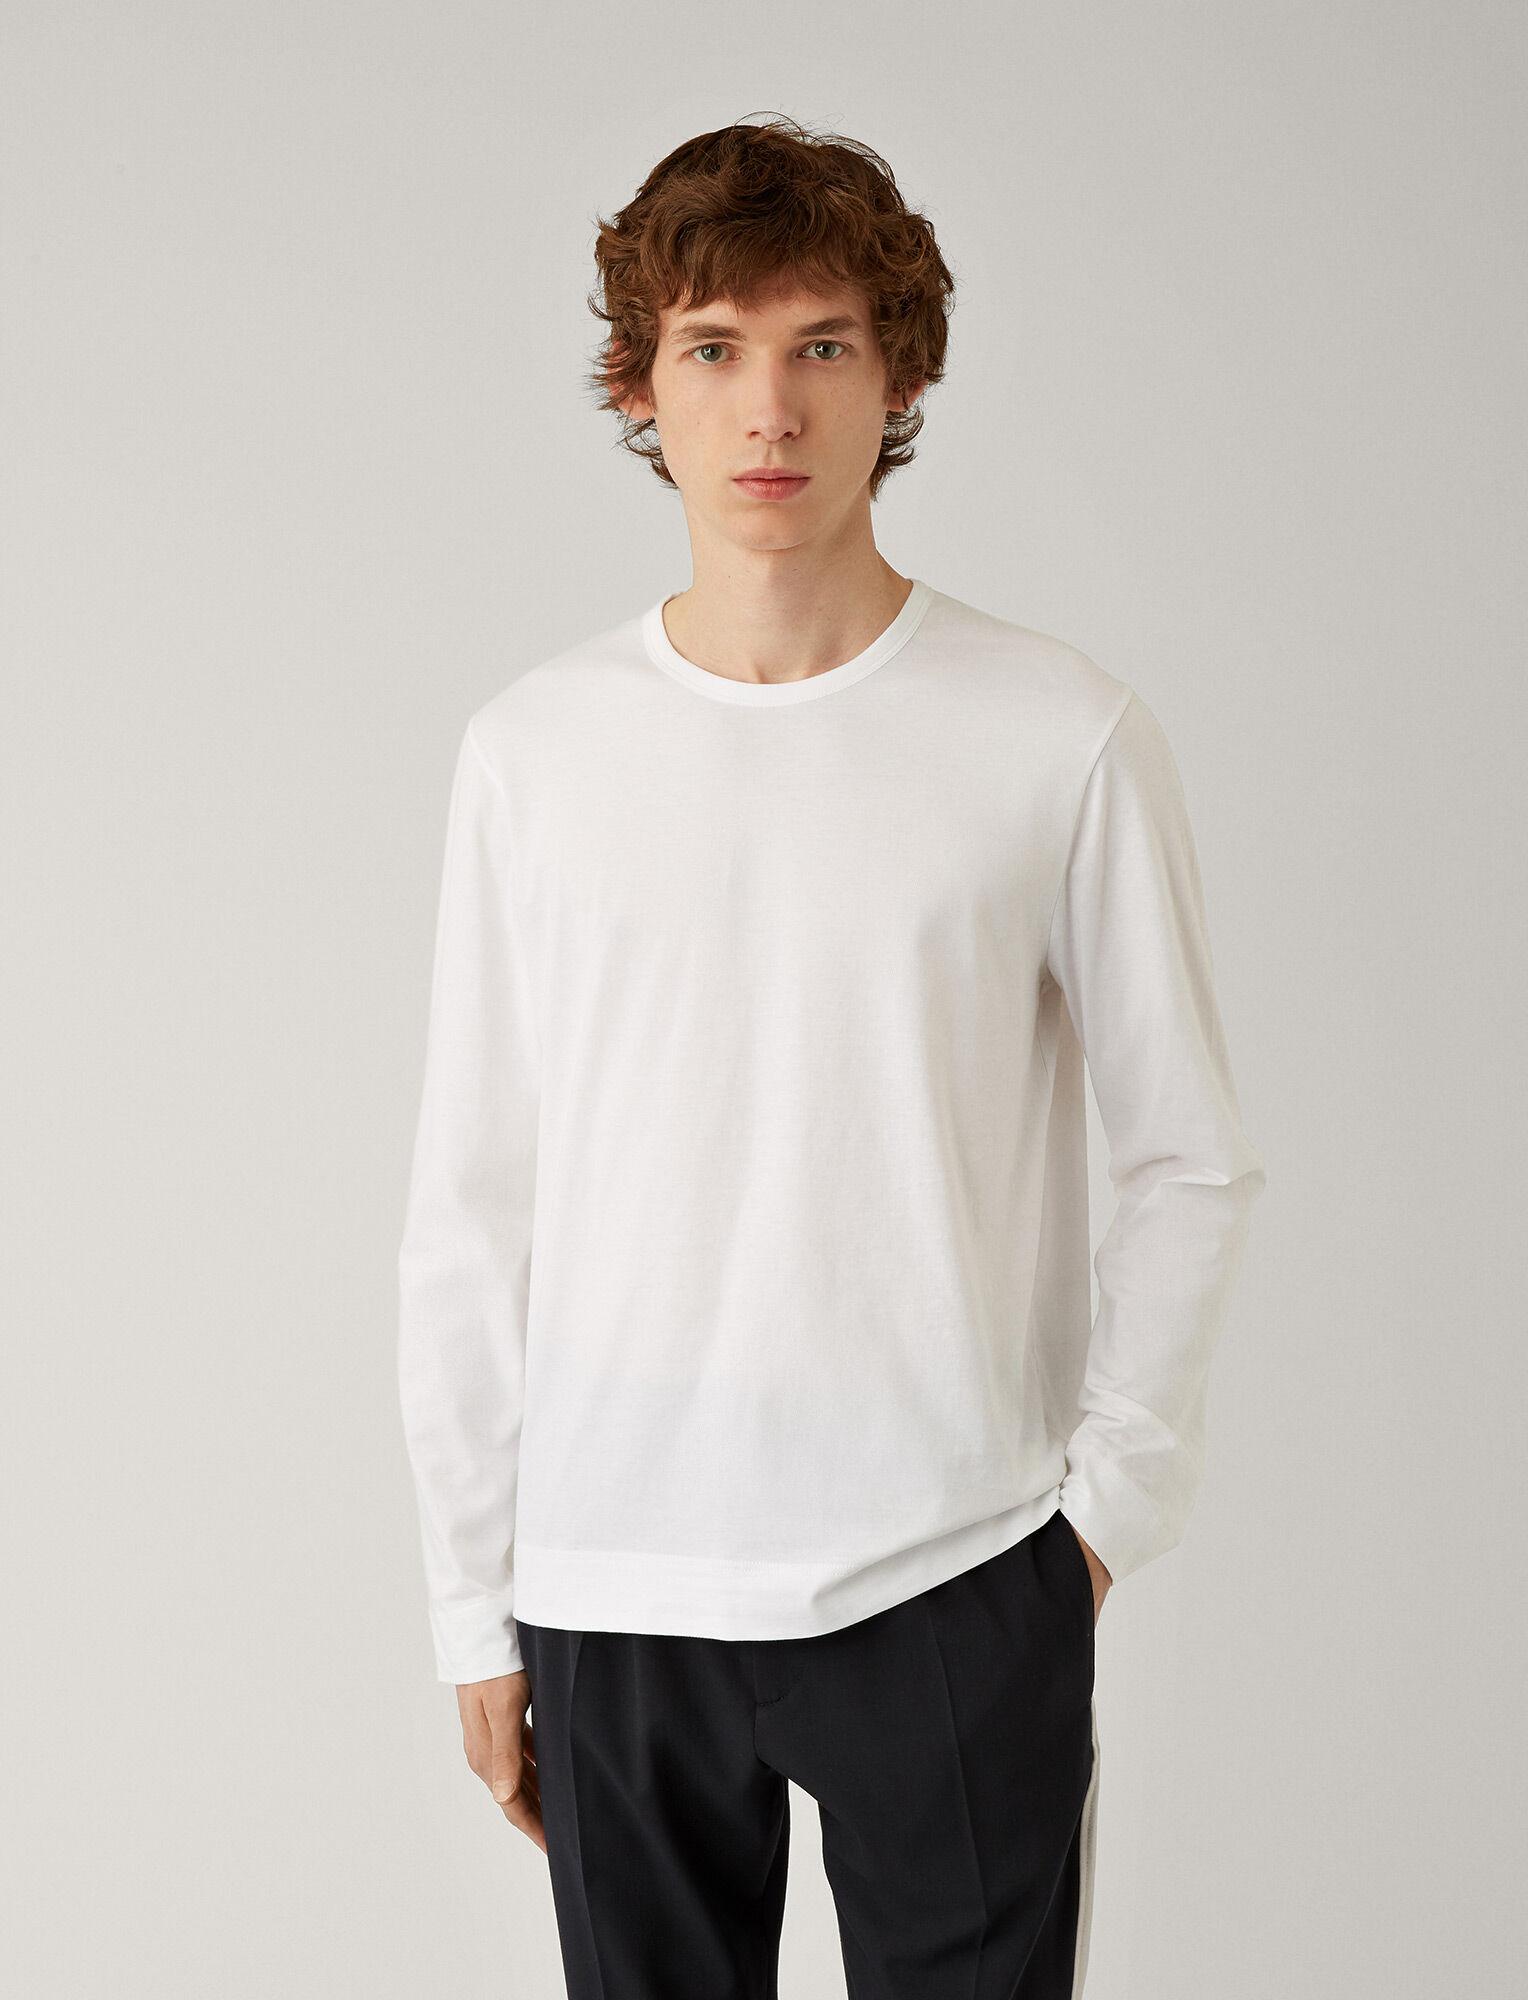 Joseph, Mercerised Jersey Top, in WHITE